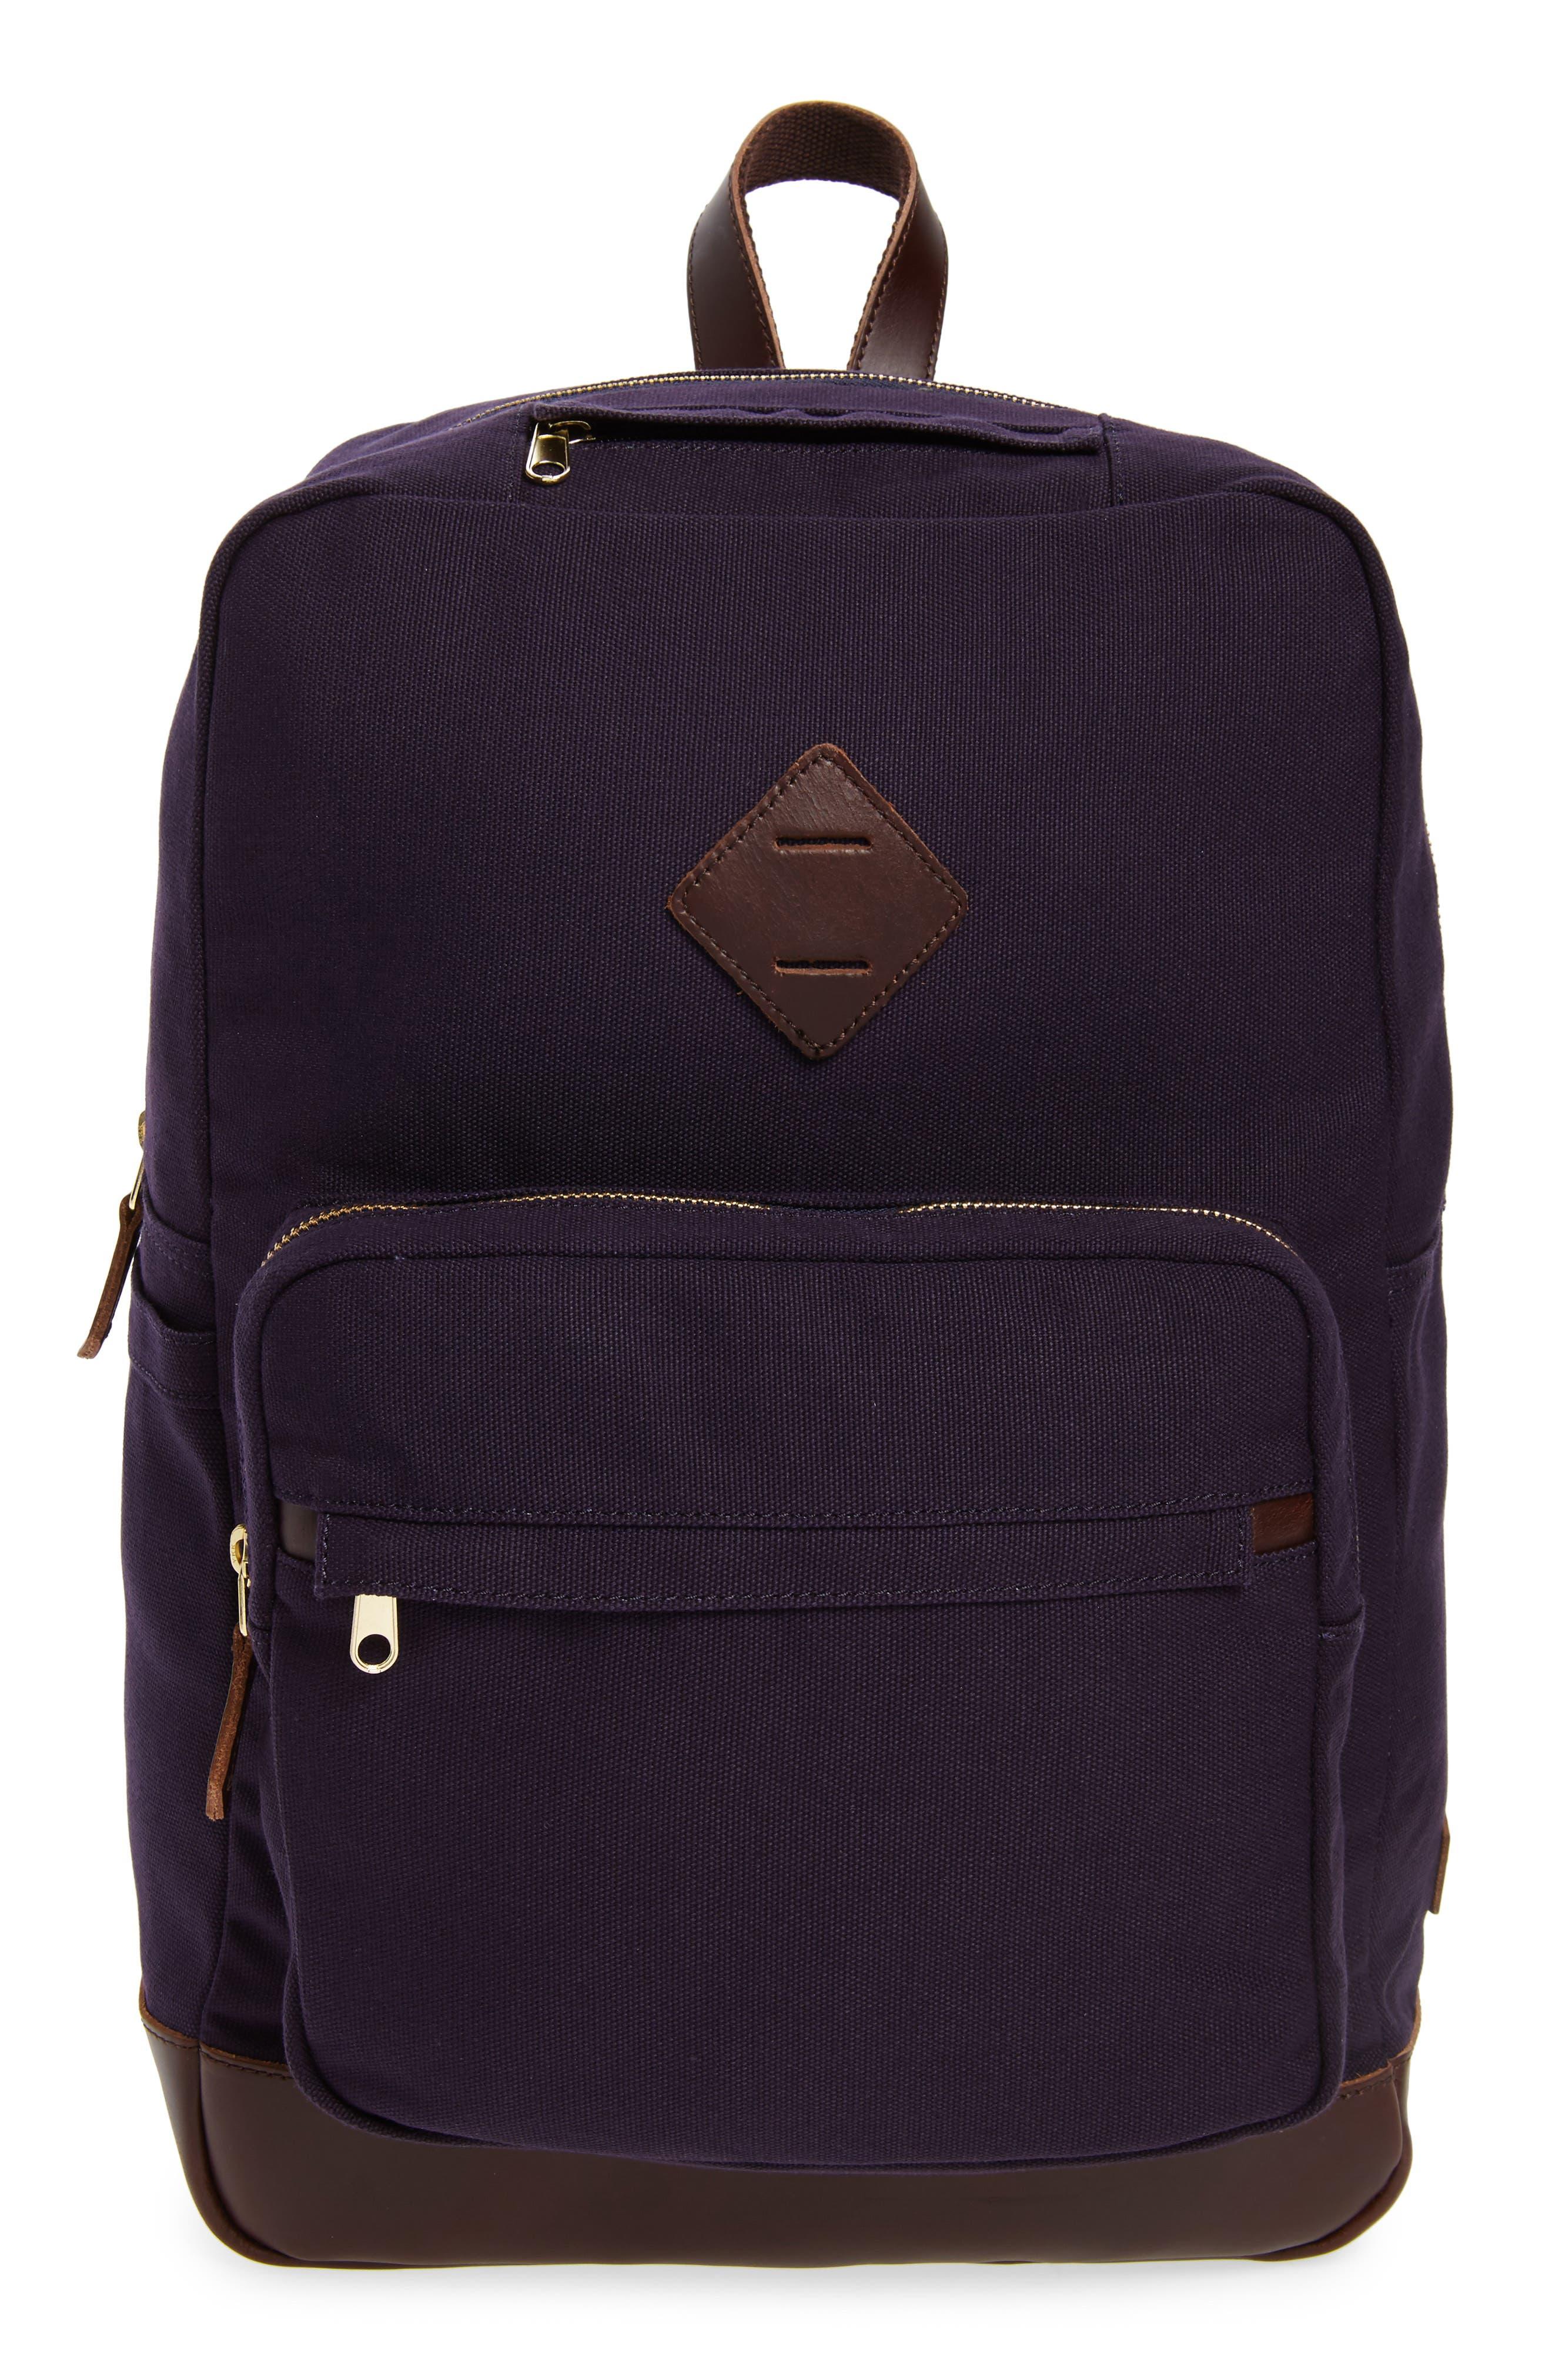 United by Blue Hudderton Backpack